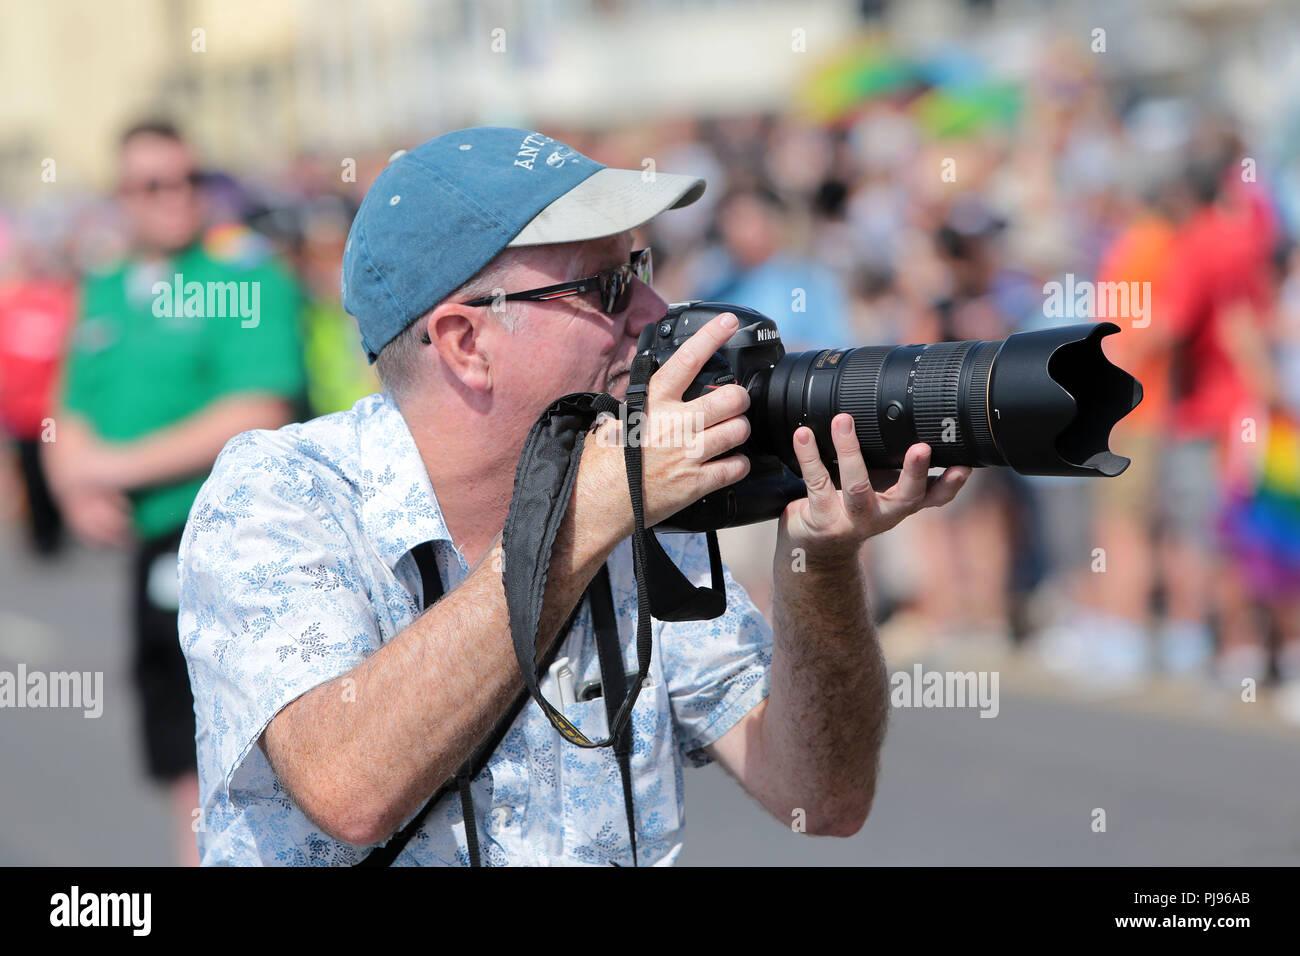 Freelance Photographer Stock Photos & Freelance Photographer